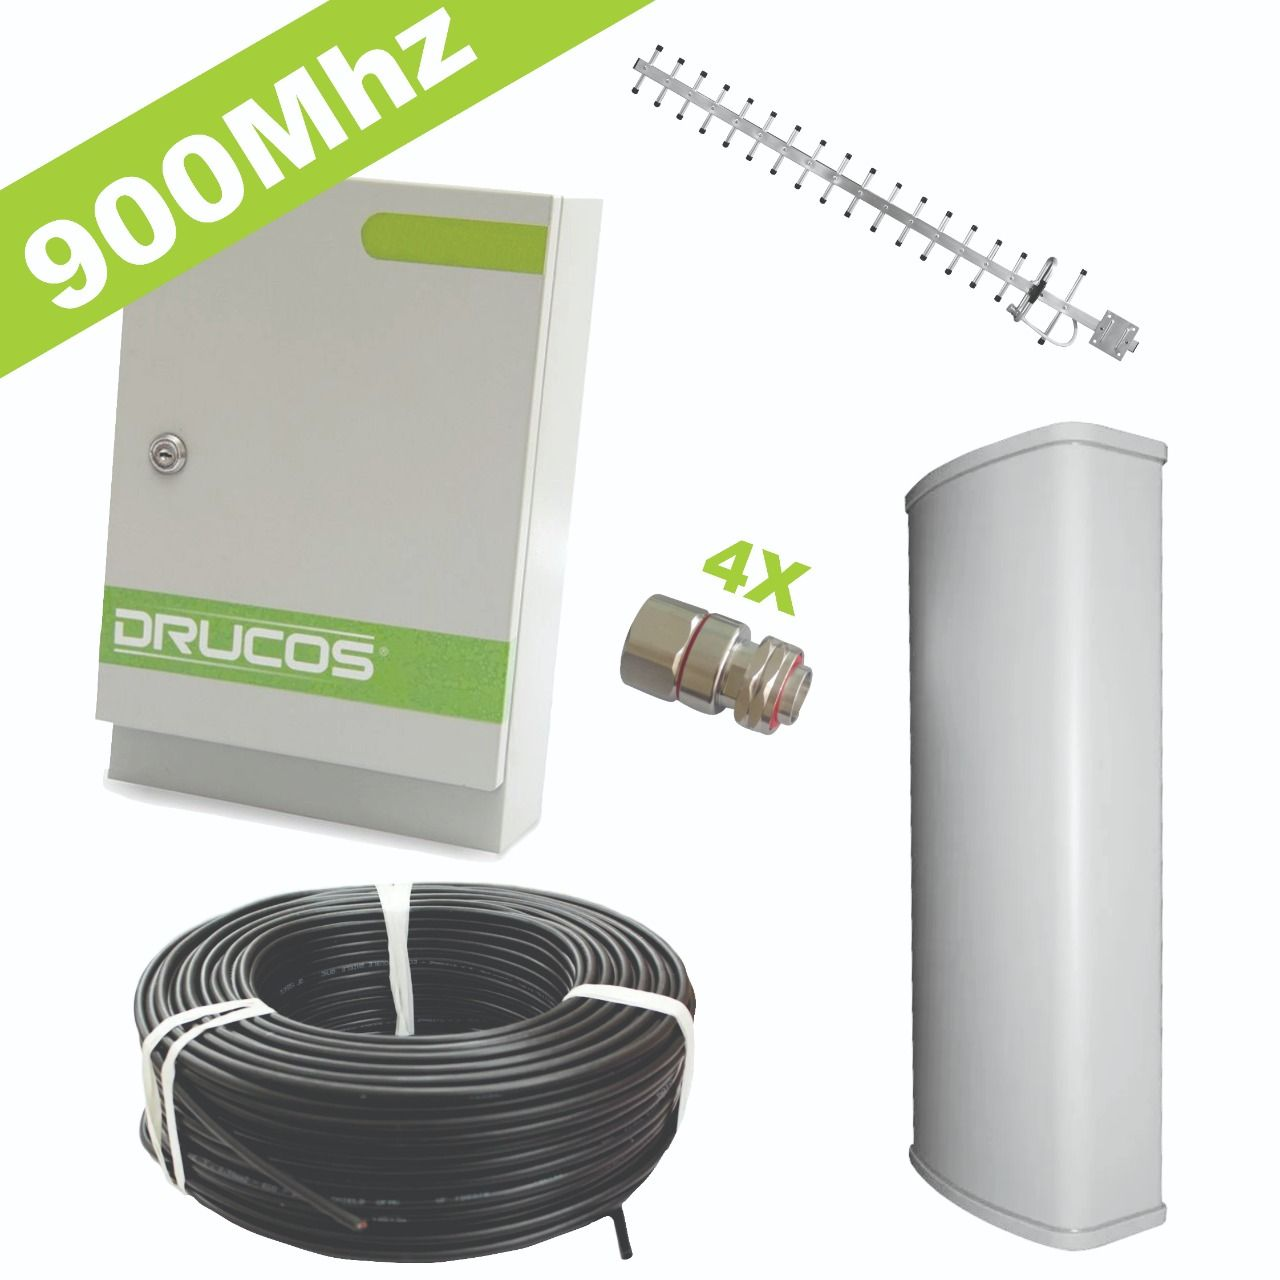 Kit de Instalação 900Mhz 2Watts 85dB (Repetidor + Antenas + Cabo + Conectores)